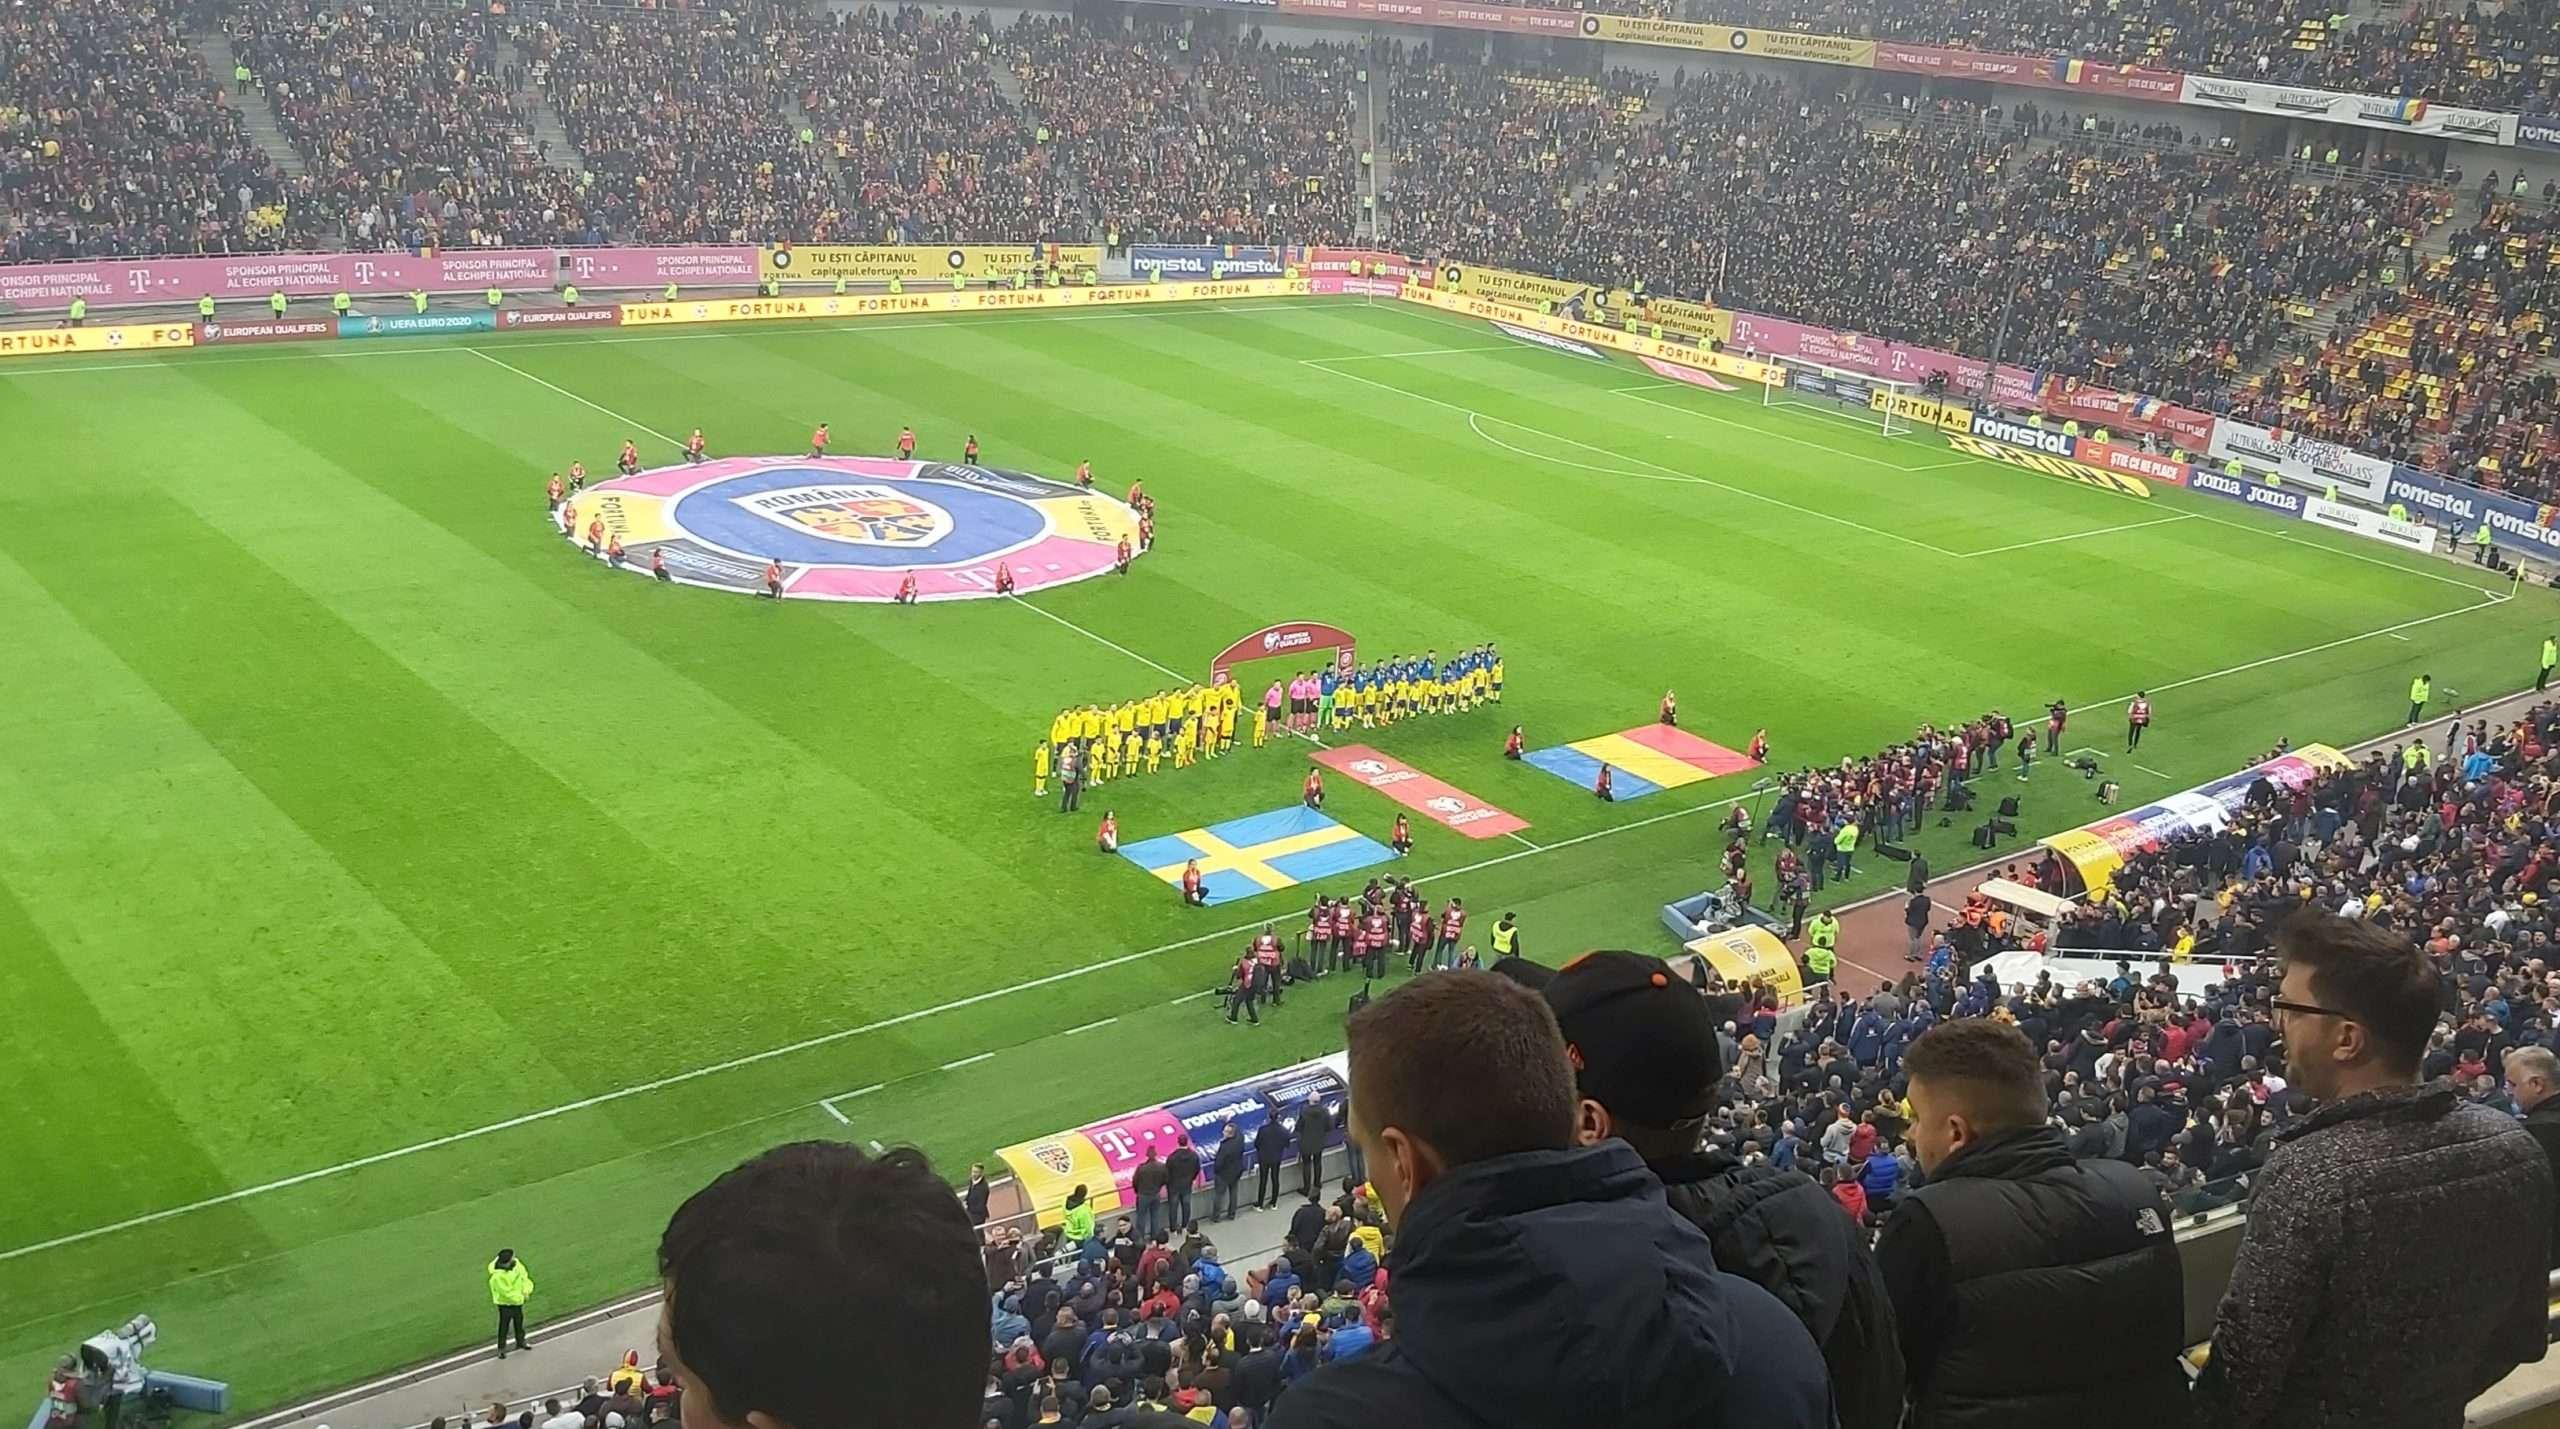 Match Report: Romania vs Sweden in the Euro 2020 Qualifiers